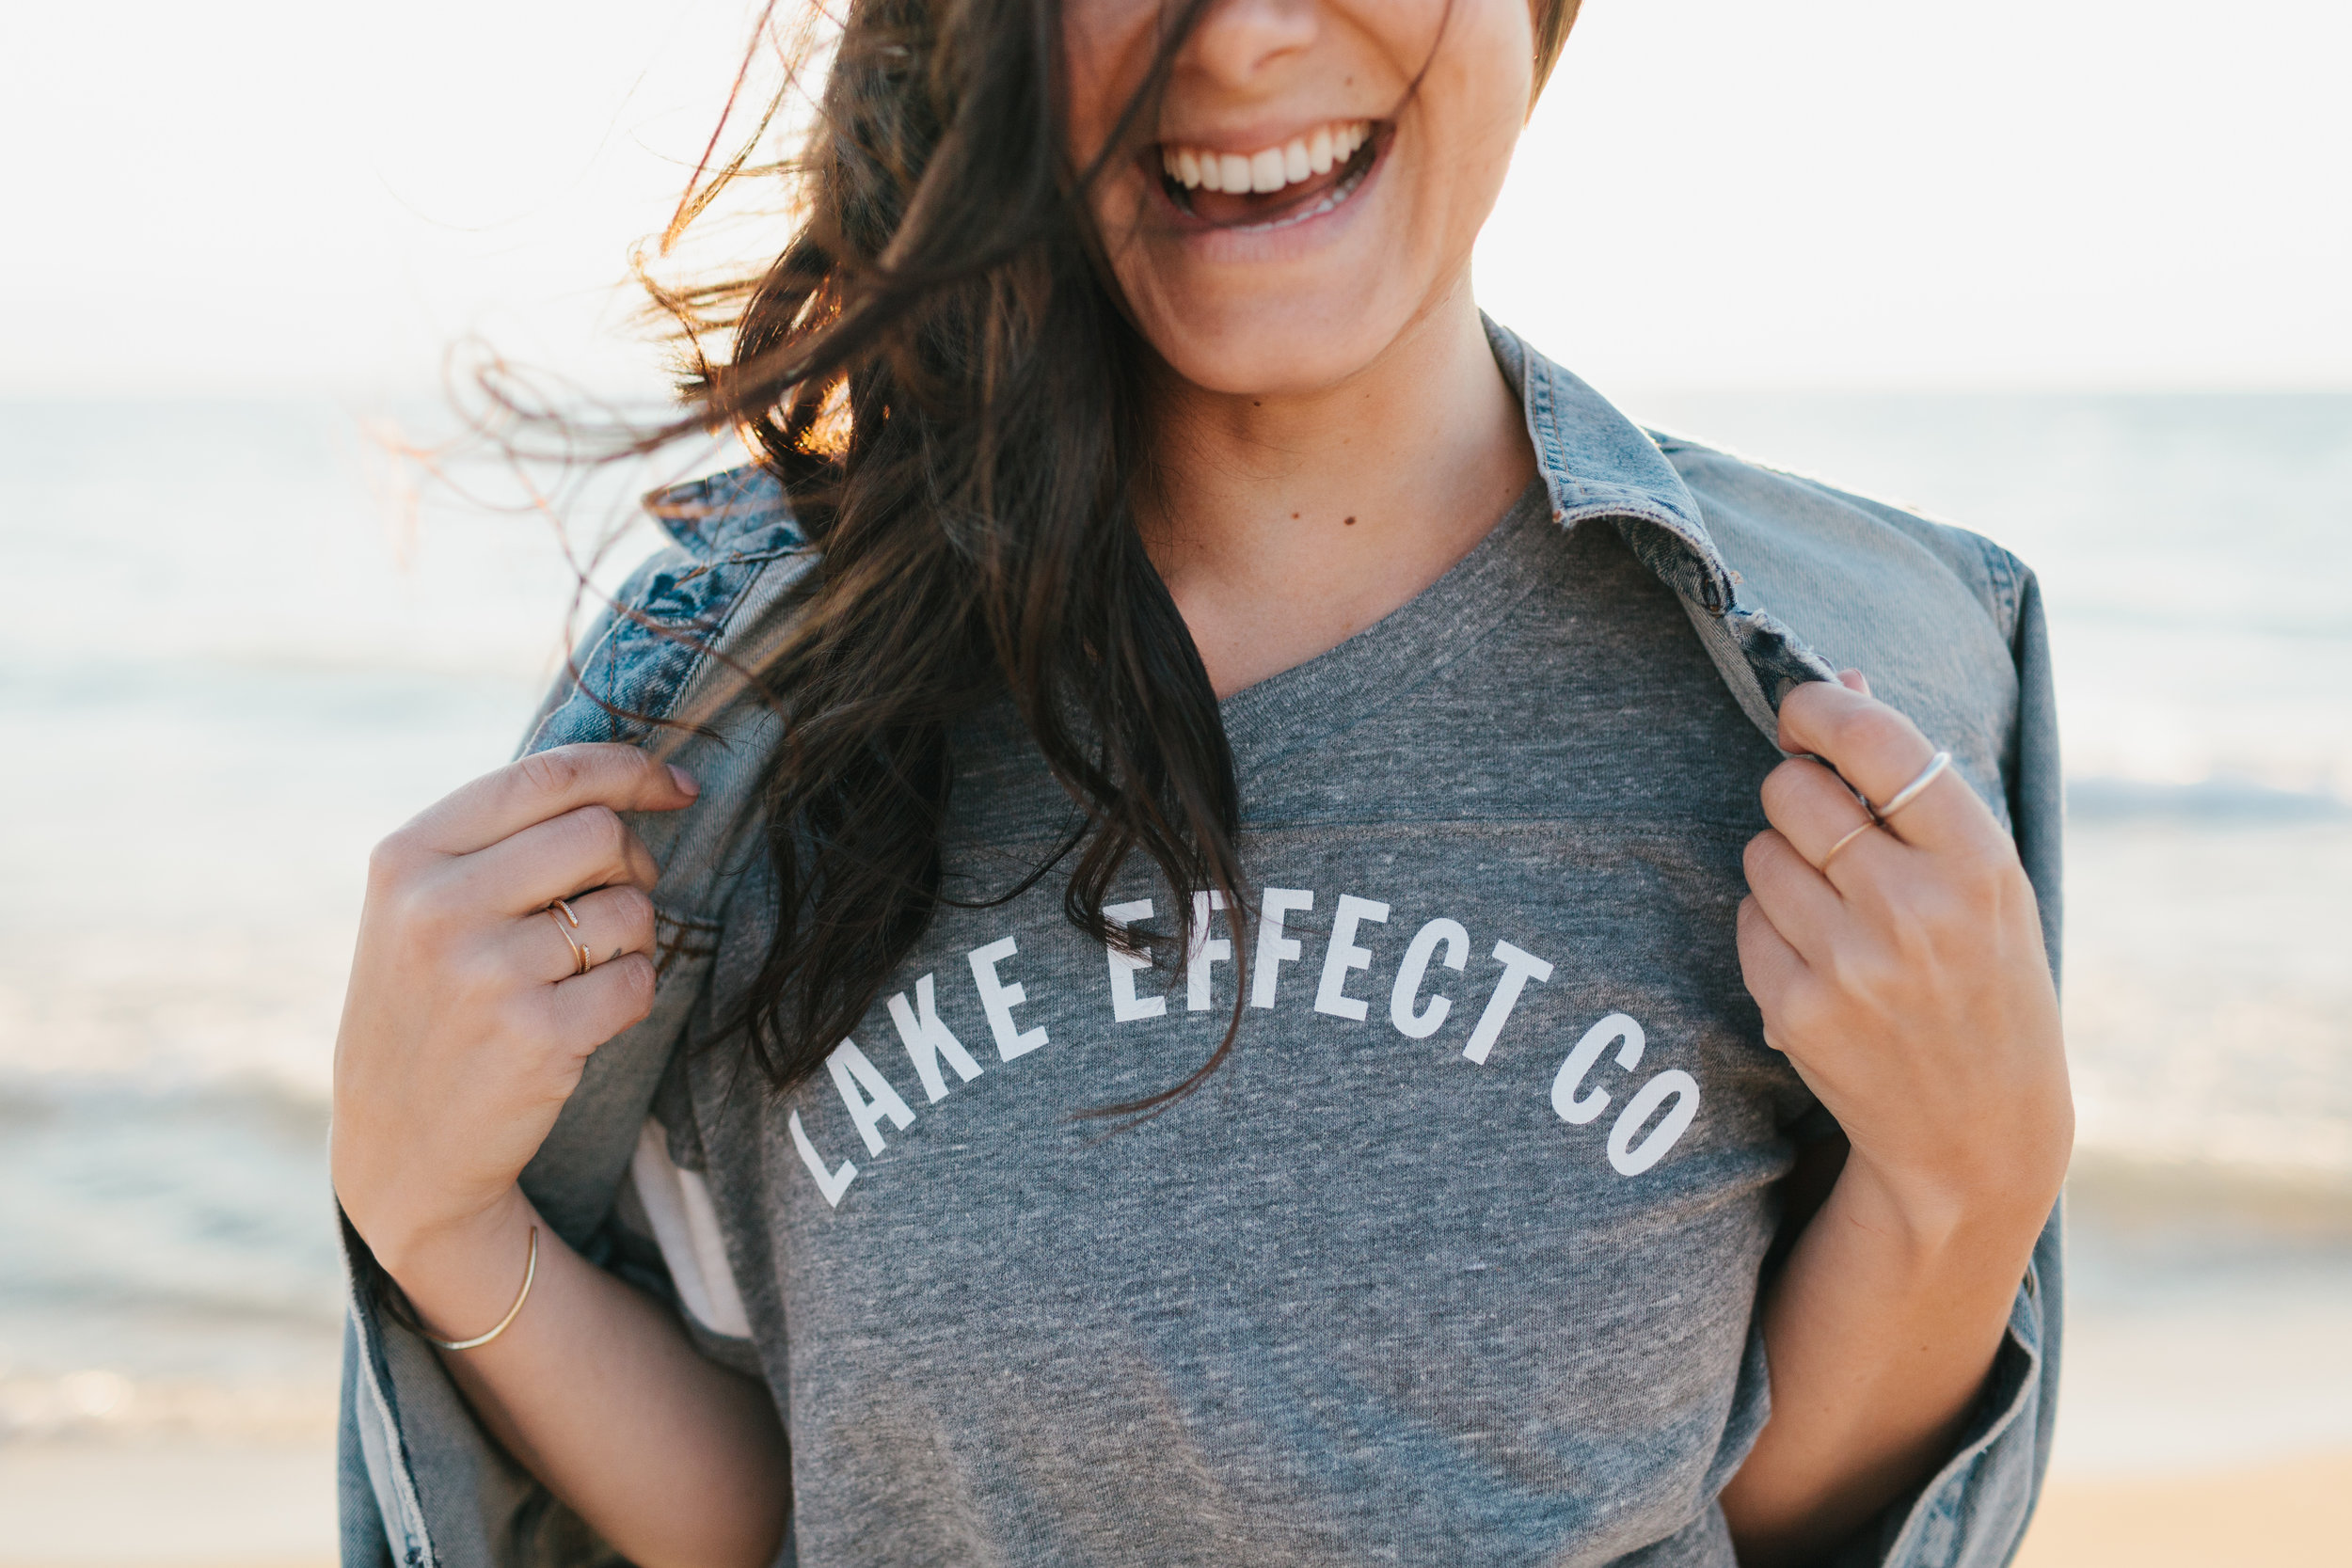 Katherine_Lake Effect Co-017.jpg